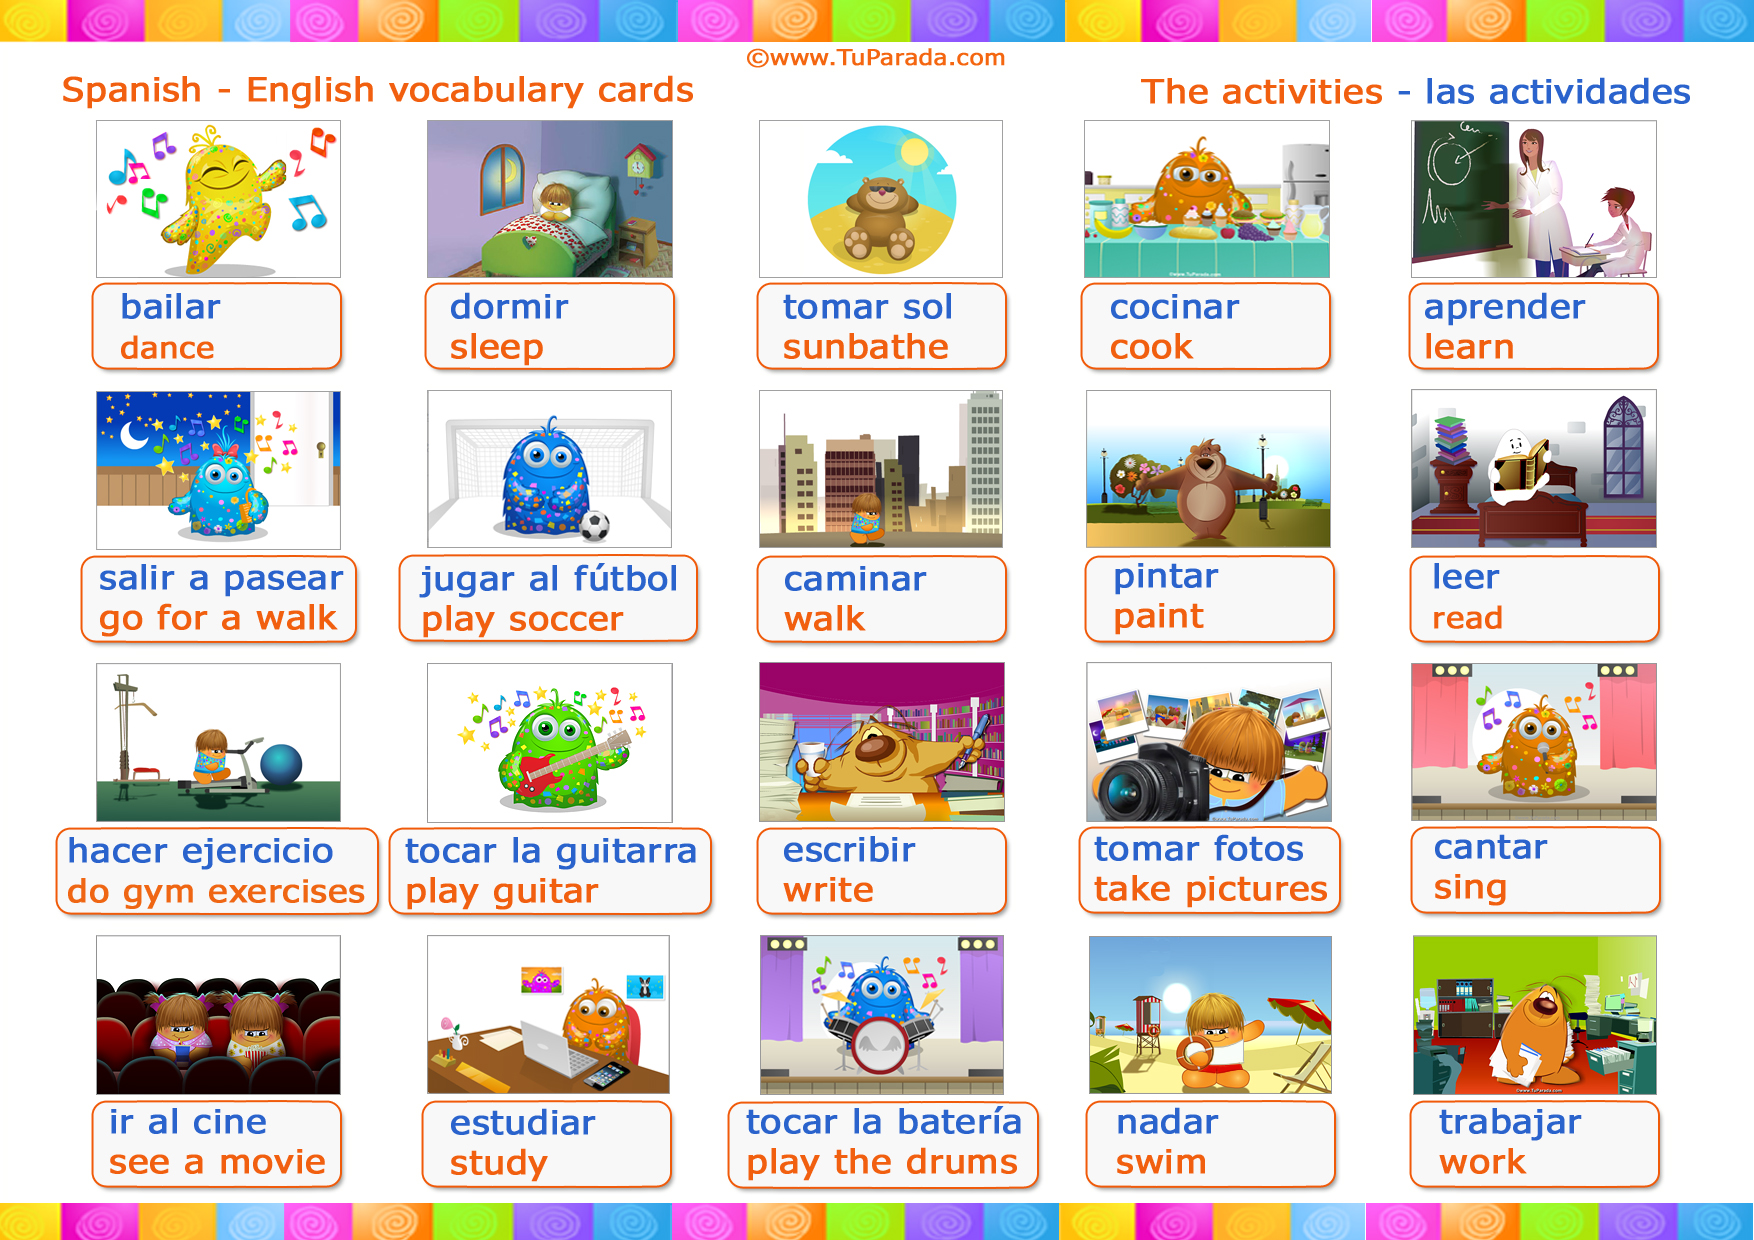 Tarjeta - Vocabulario: Actividades - Activities.